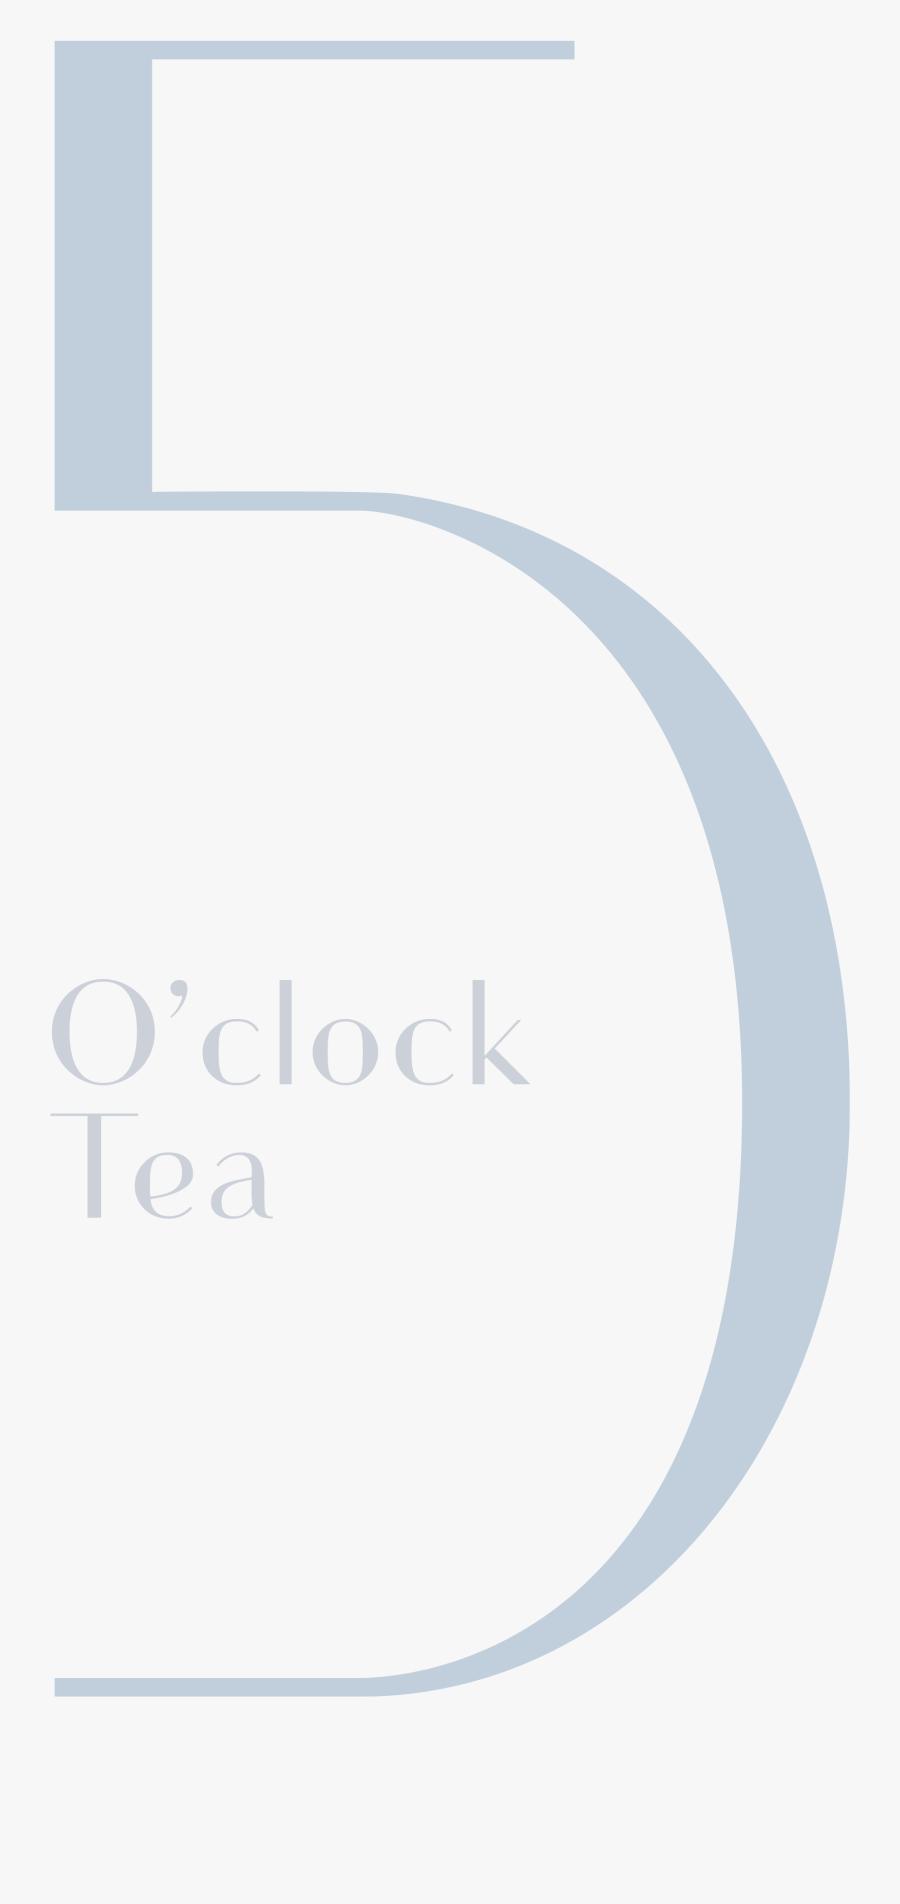 Transparent Alice In Wonderland Clock Clipart - Circle, Transparent Clipart